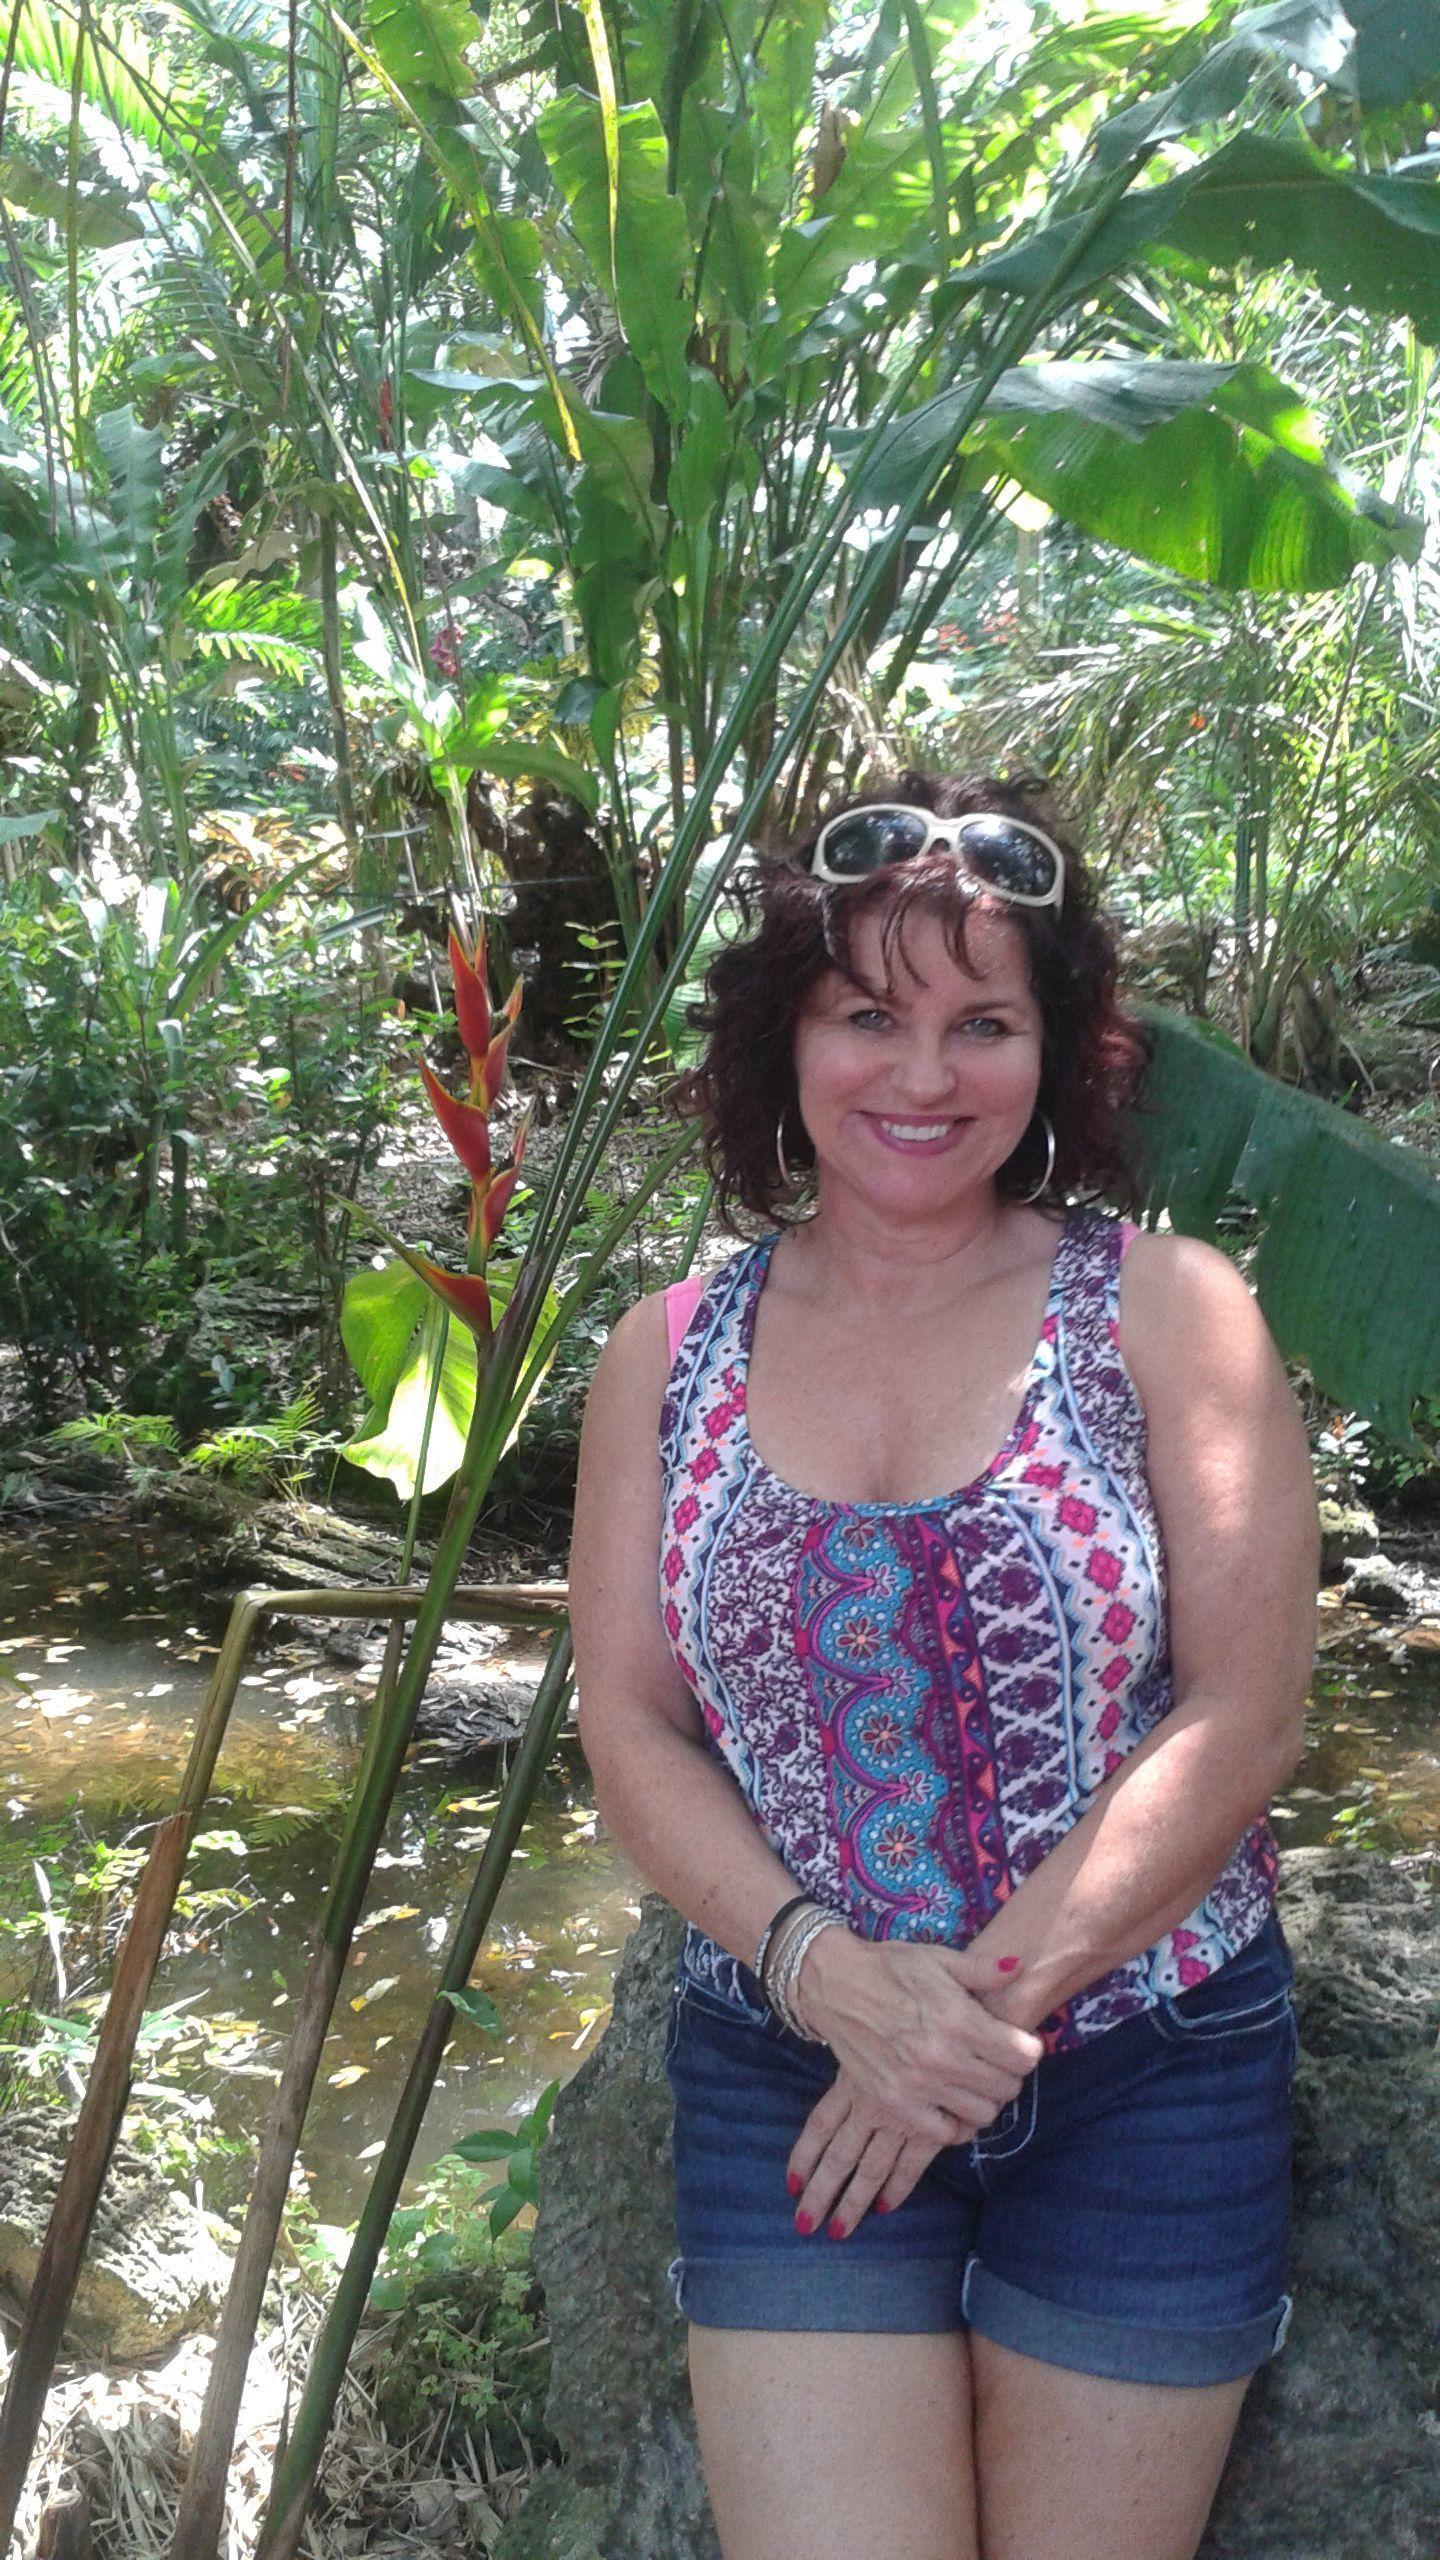 activities for singles in miami